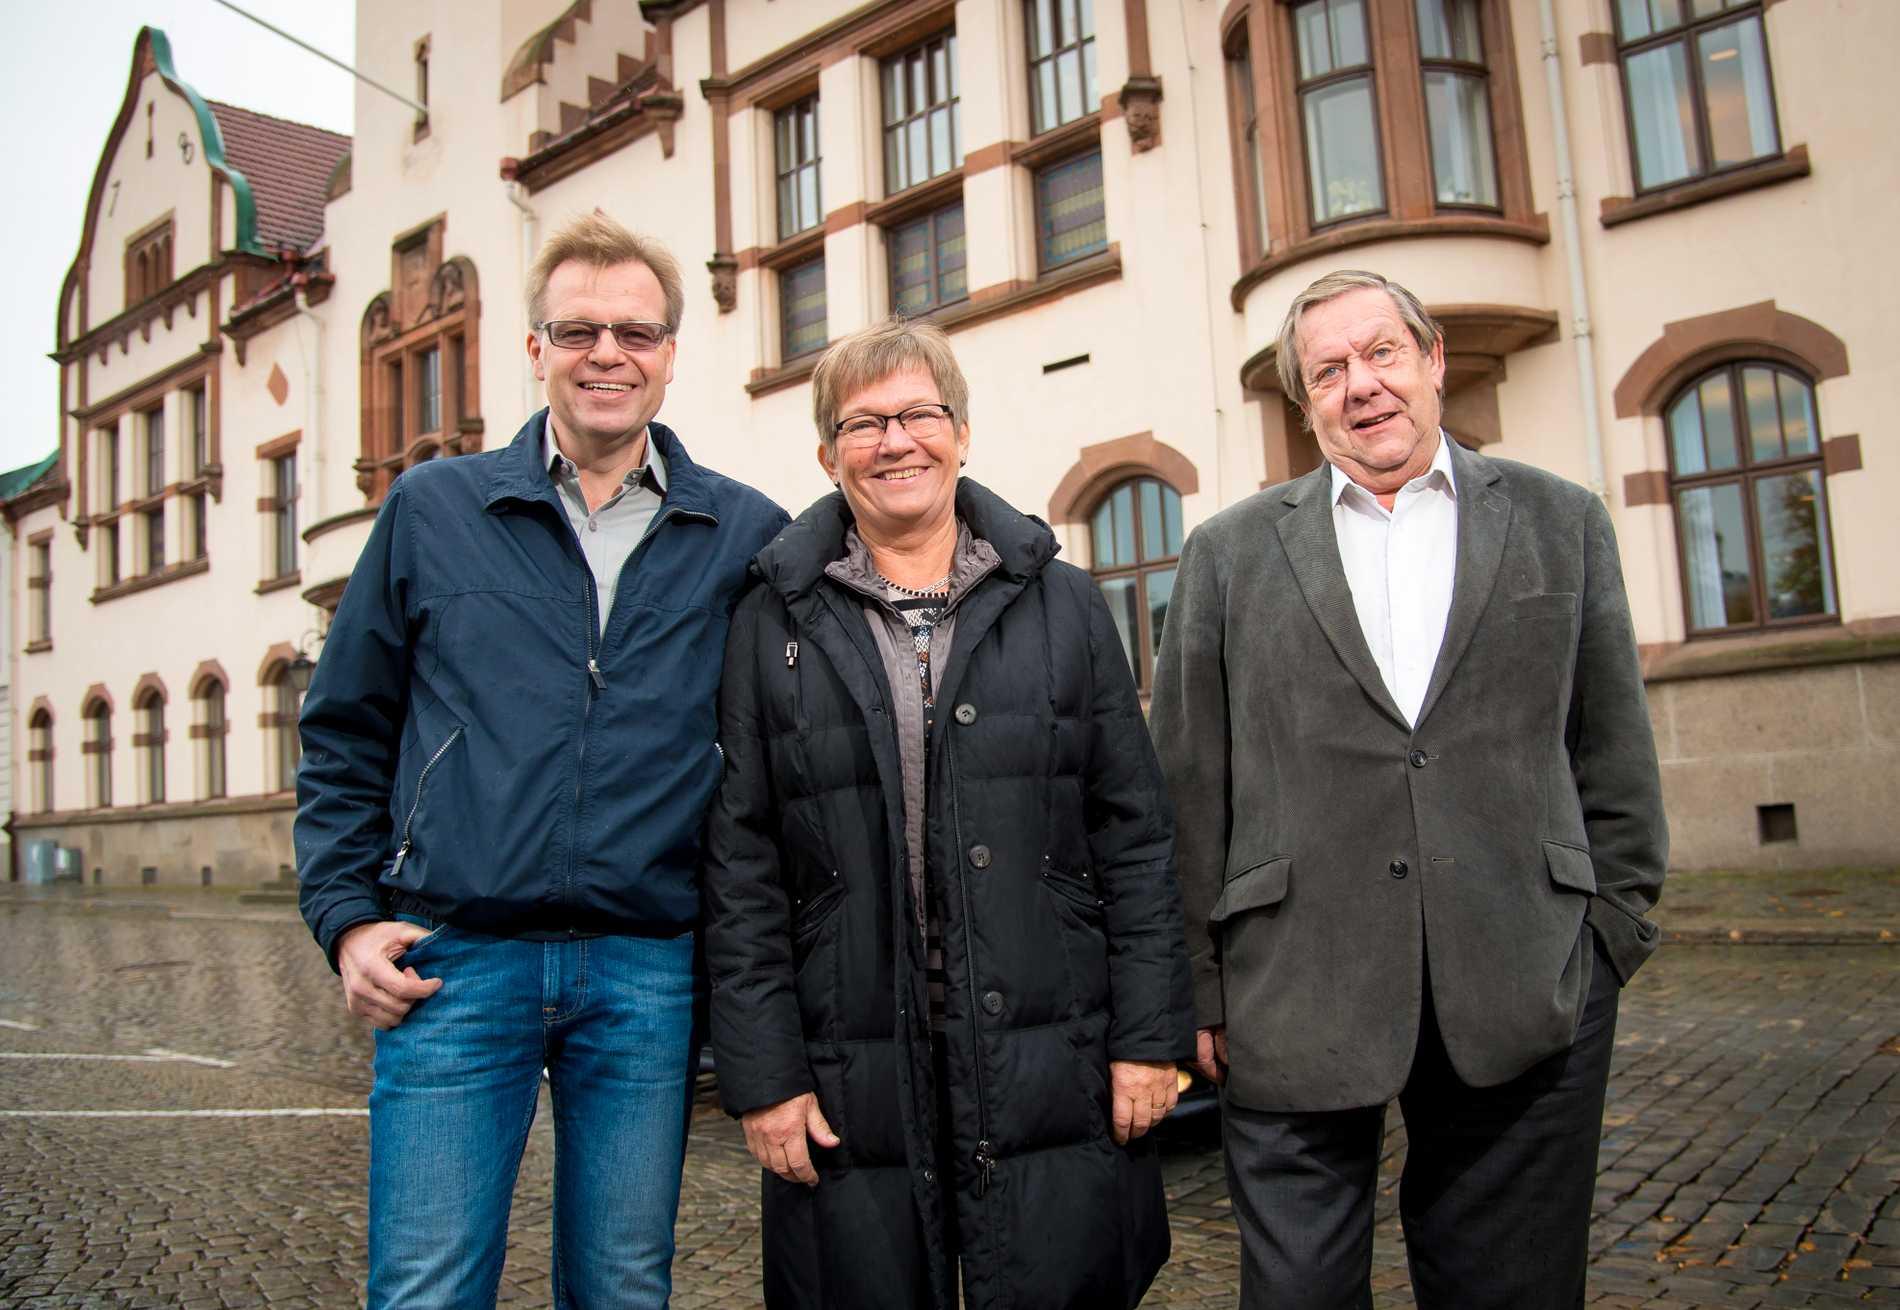 Per-Ola Mattsson (S), Gertrud Ivarsson (C) och Paul Hedlund (L) styr Karlshamns kommun.